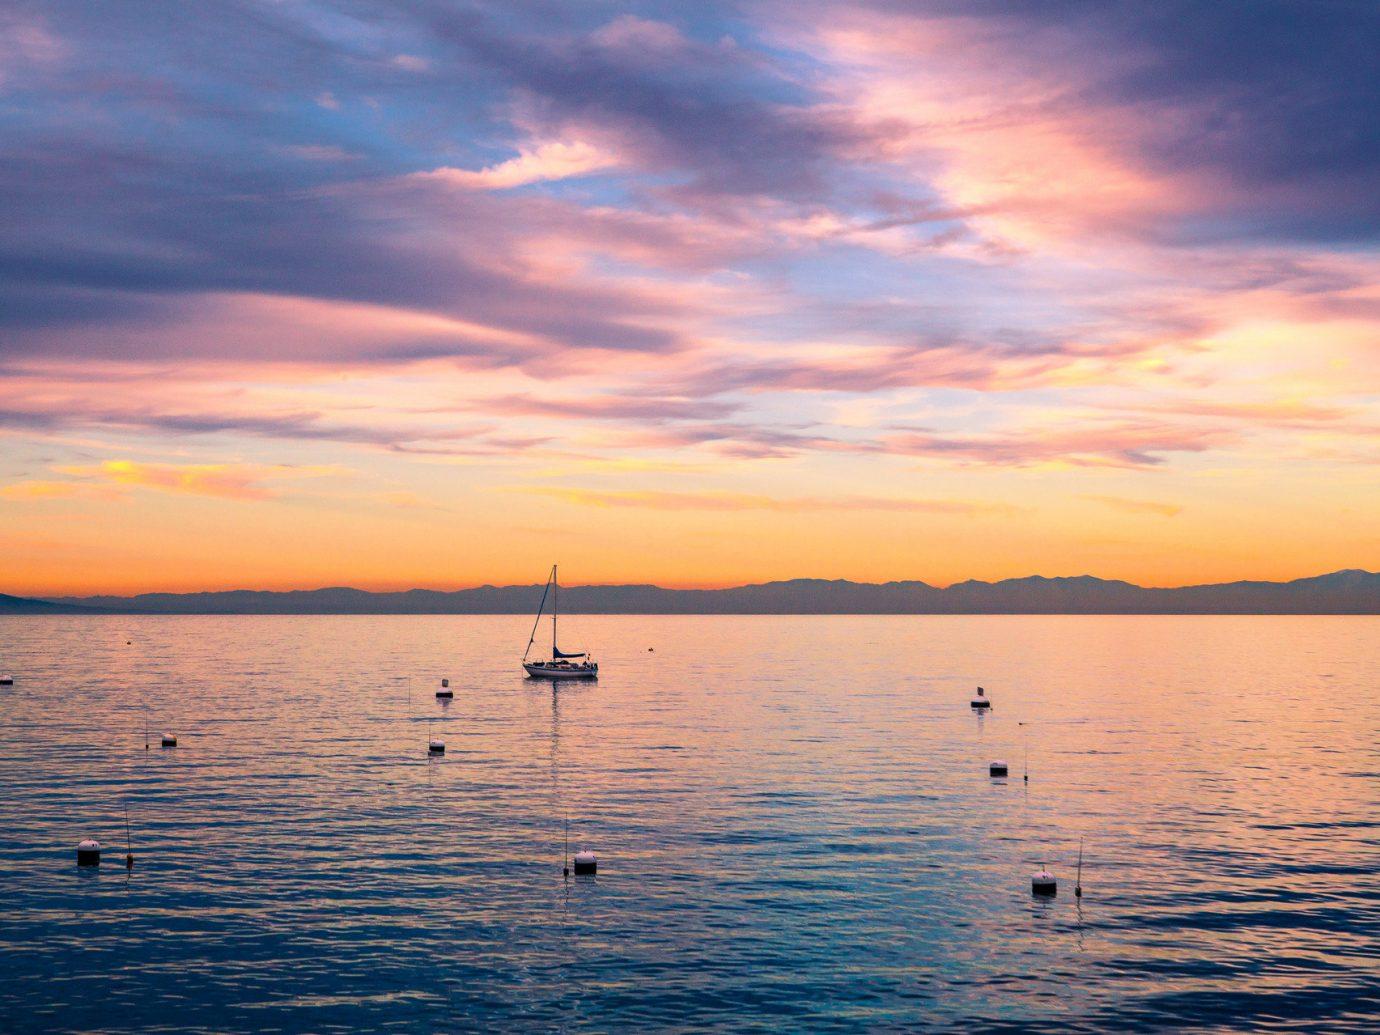 Trip Ideas water sky outdoor Sunset Boat Sea horizon afterglow sunrise cloud shore dawn morning dusk Ocean evening reflection Lake loch distance